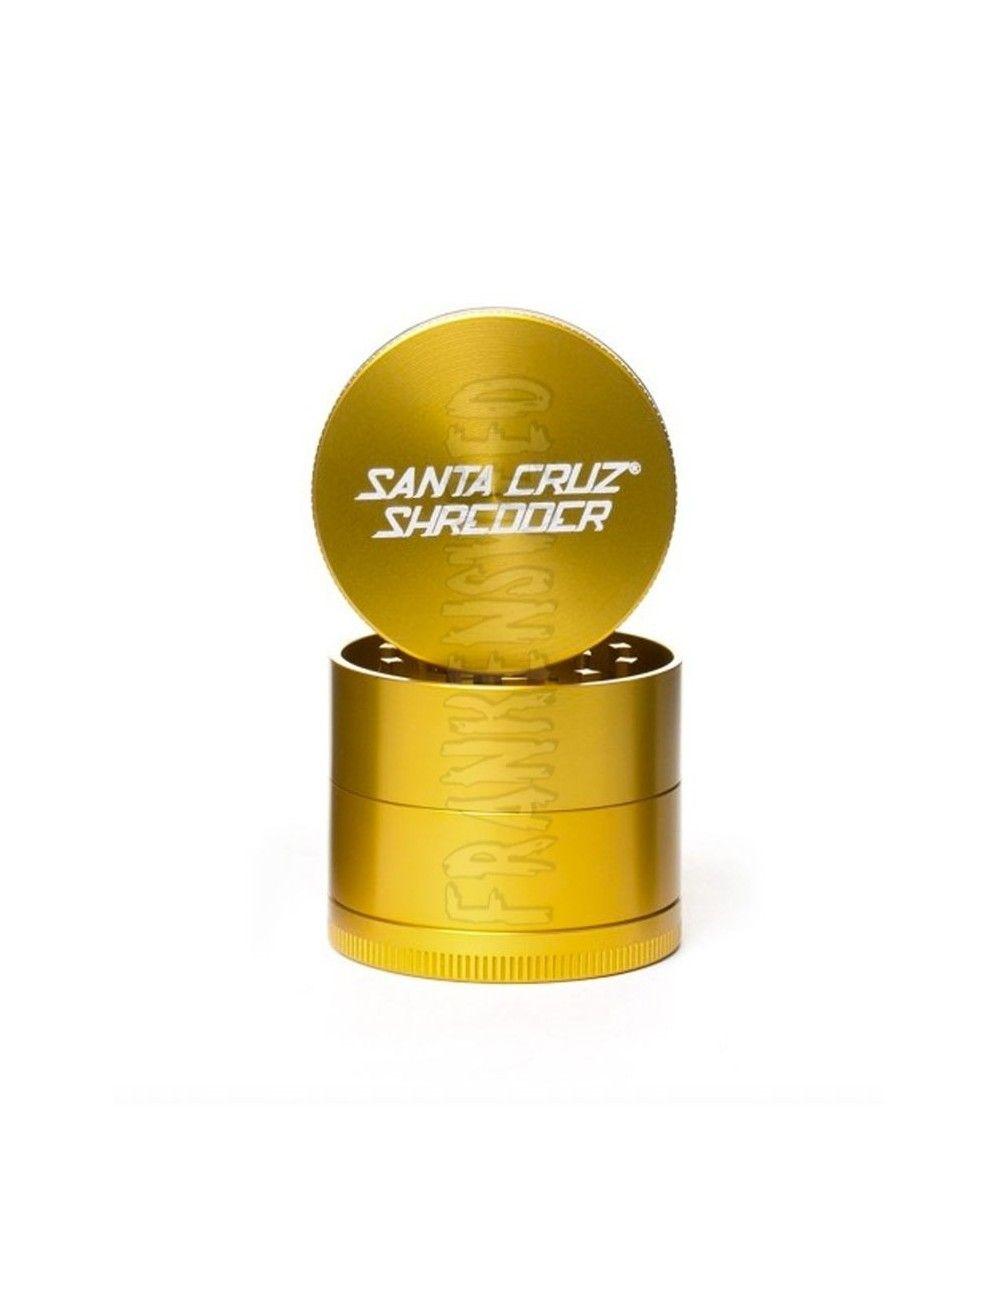 Santa Cruz Shredder 4-piece Medium - Gold Gloss